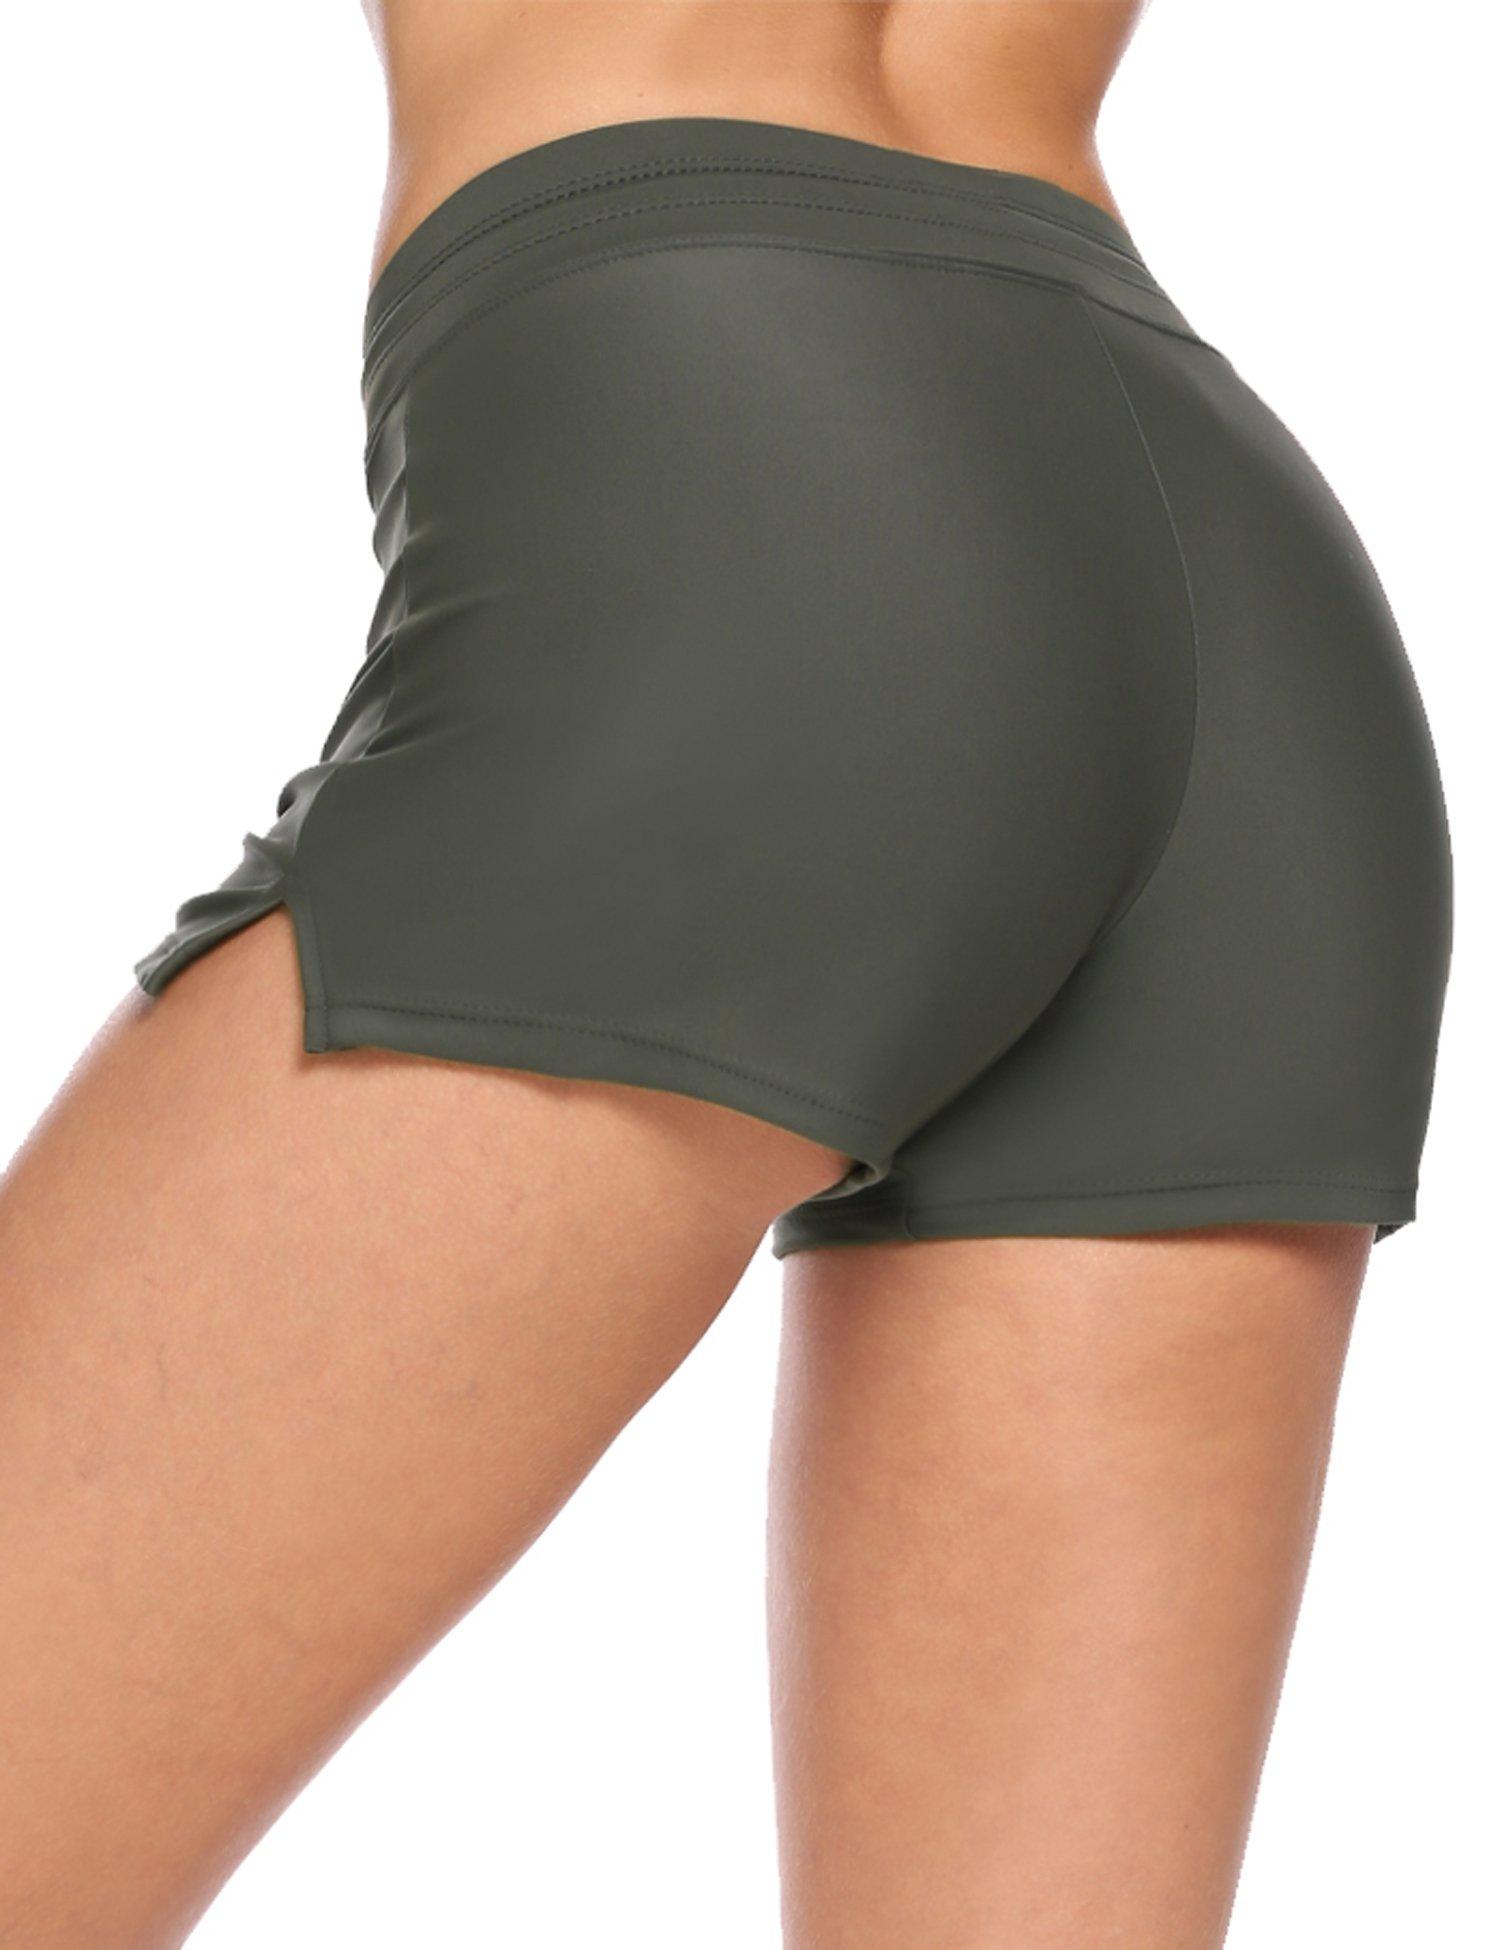 Avidlove Women's Slim Boardshorts Solid Color Side Split Sports Board Shorts(Brown, XXL)